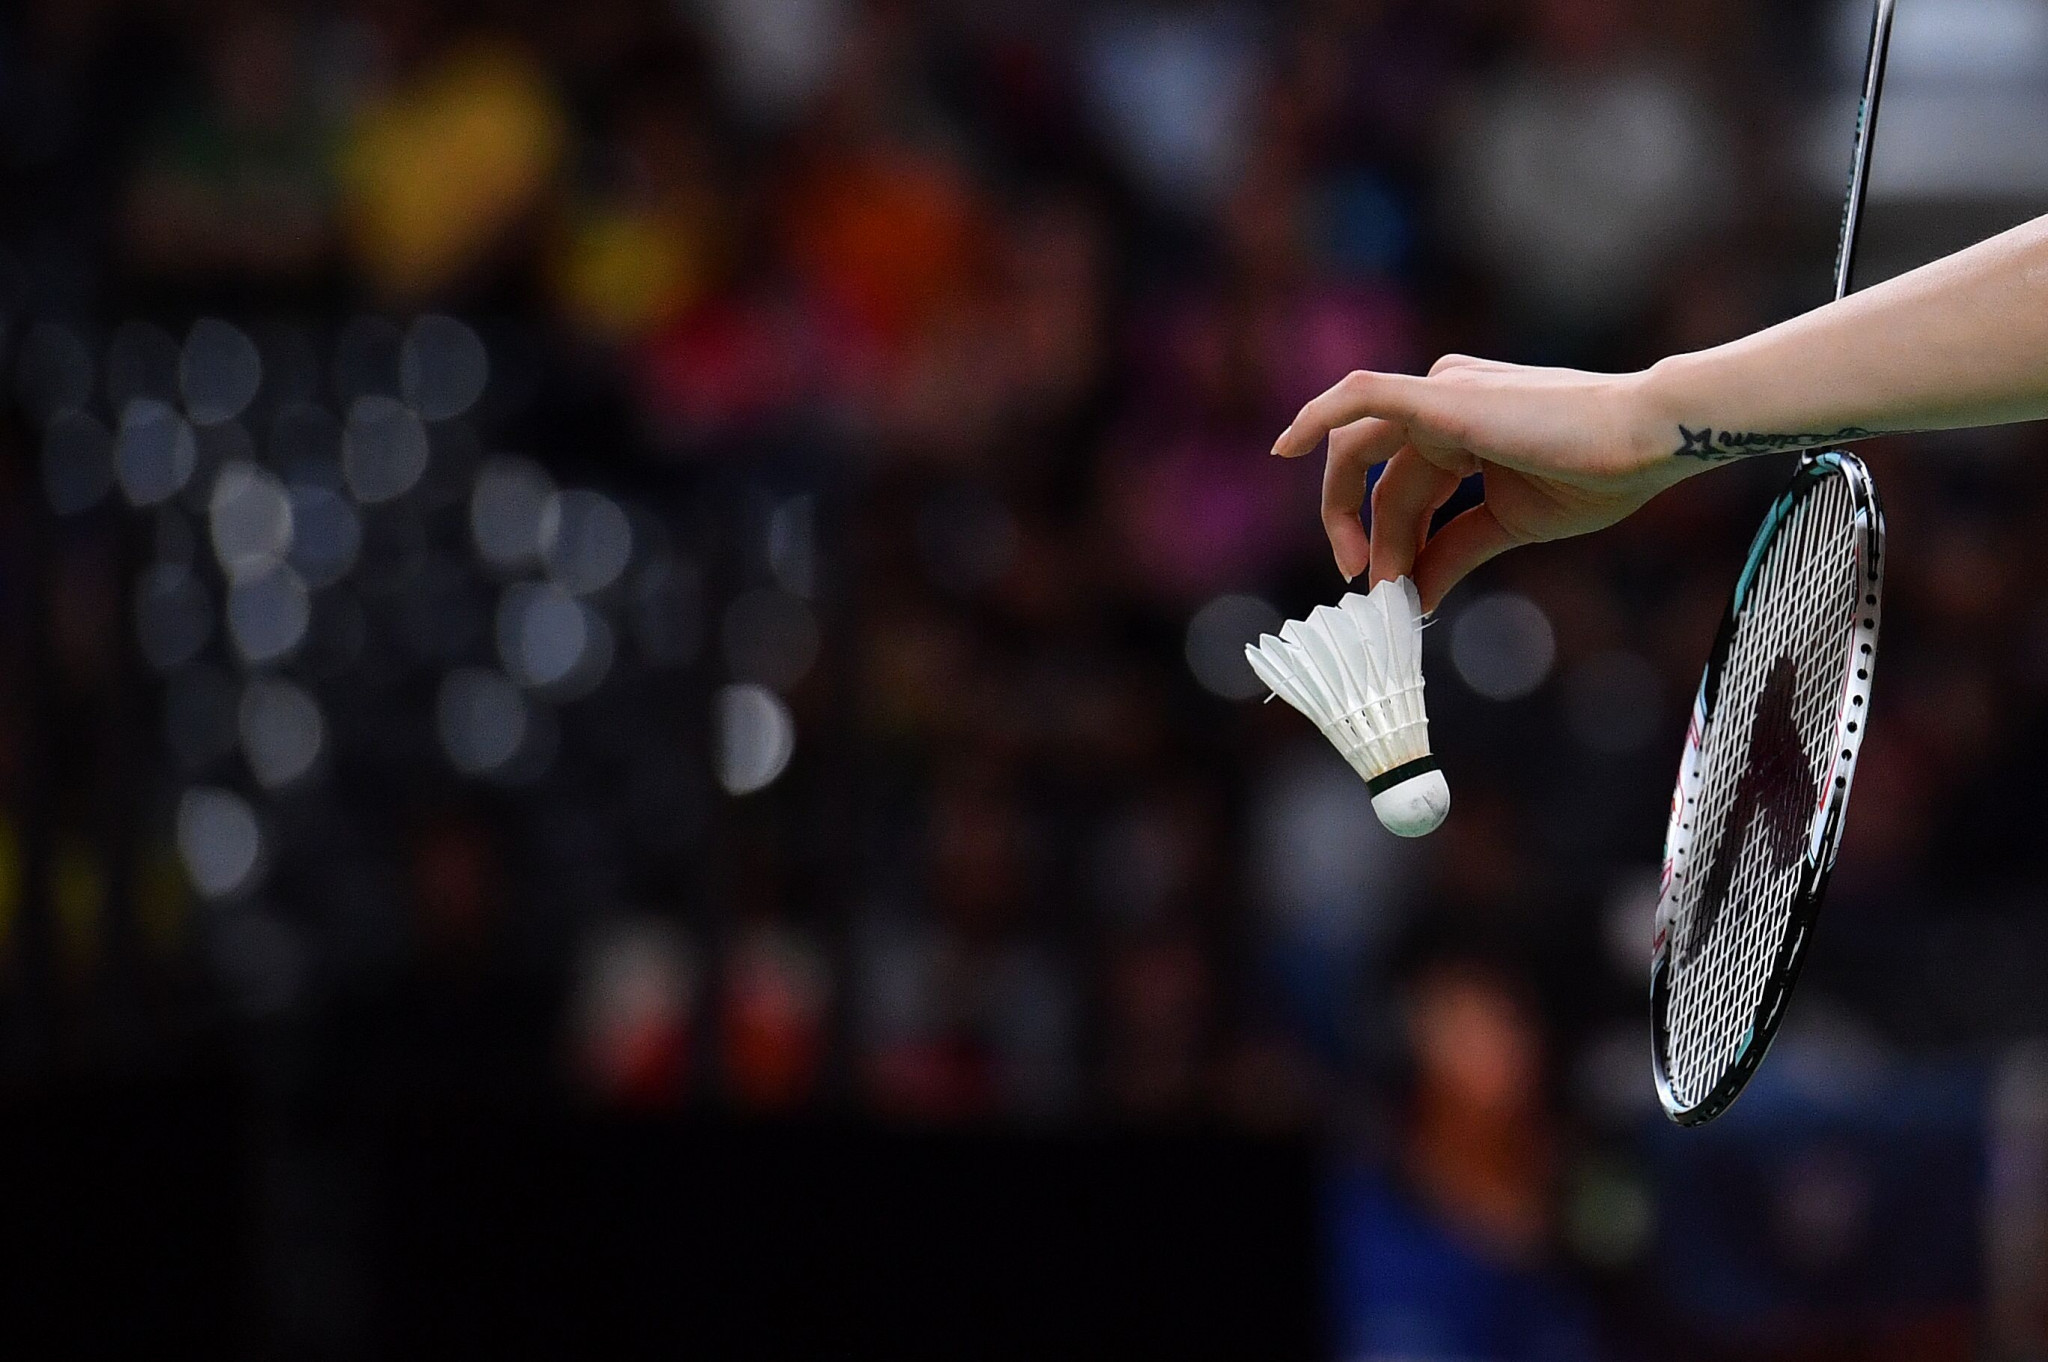 German Open badminton cancelled over coronavirus restrictions